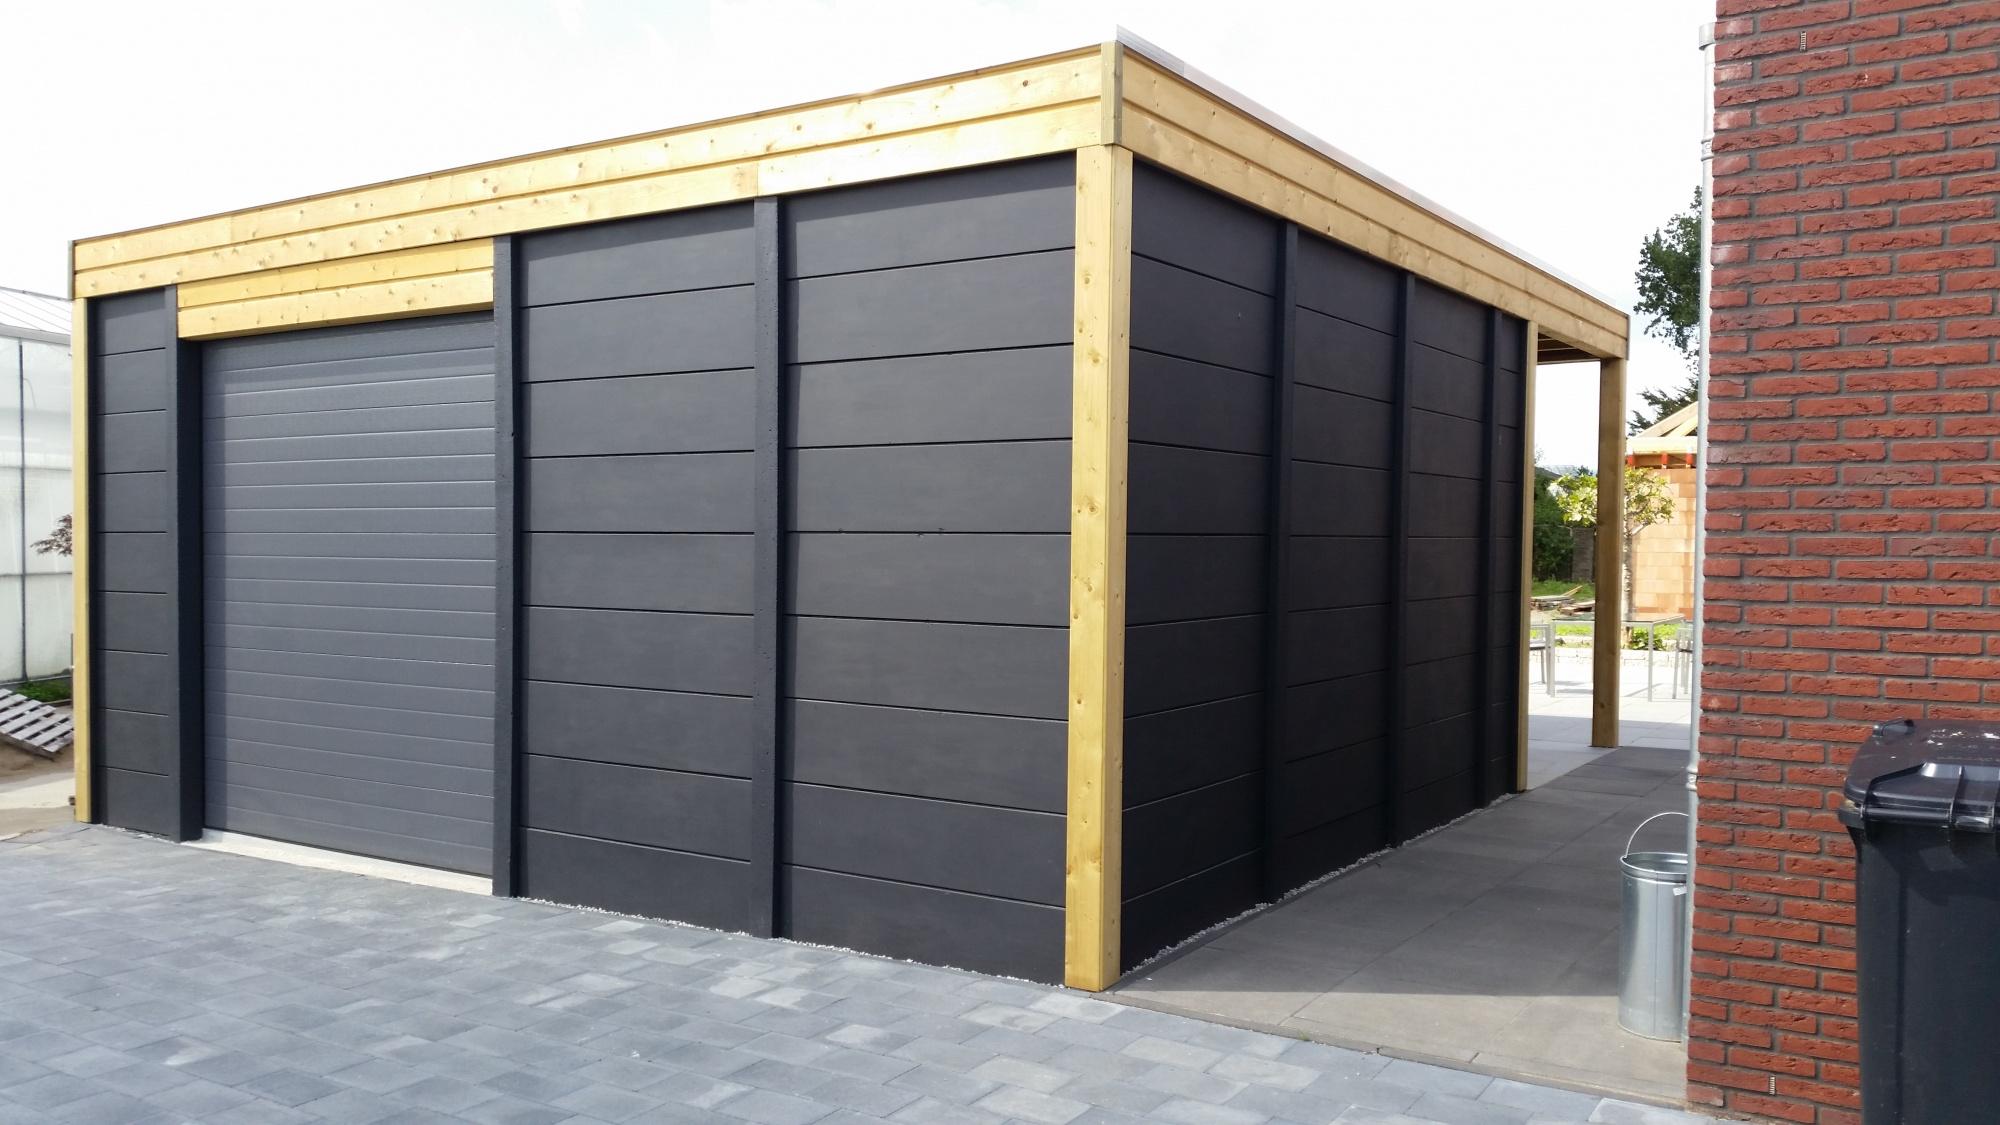 garage berging in dubbelwandige uitvoering. Black Bedroom Furniture Sets. Home Design Ideas